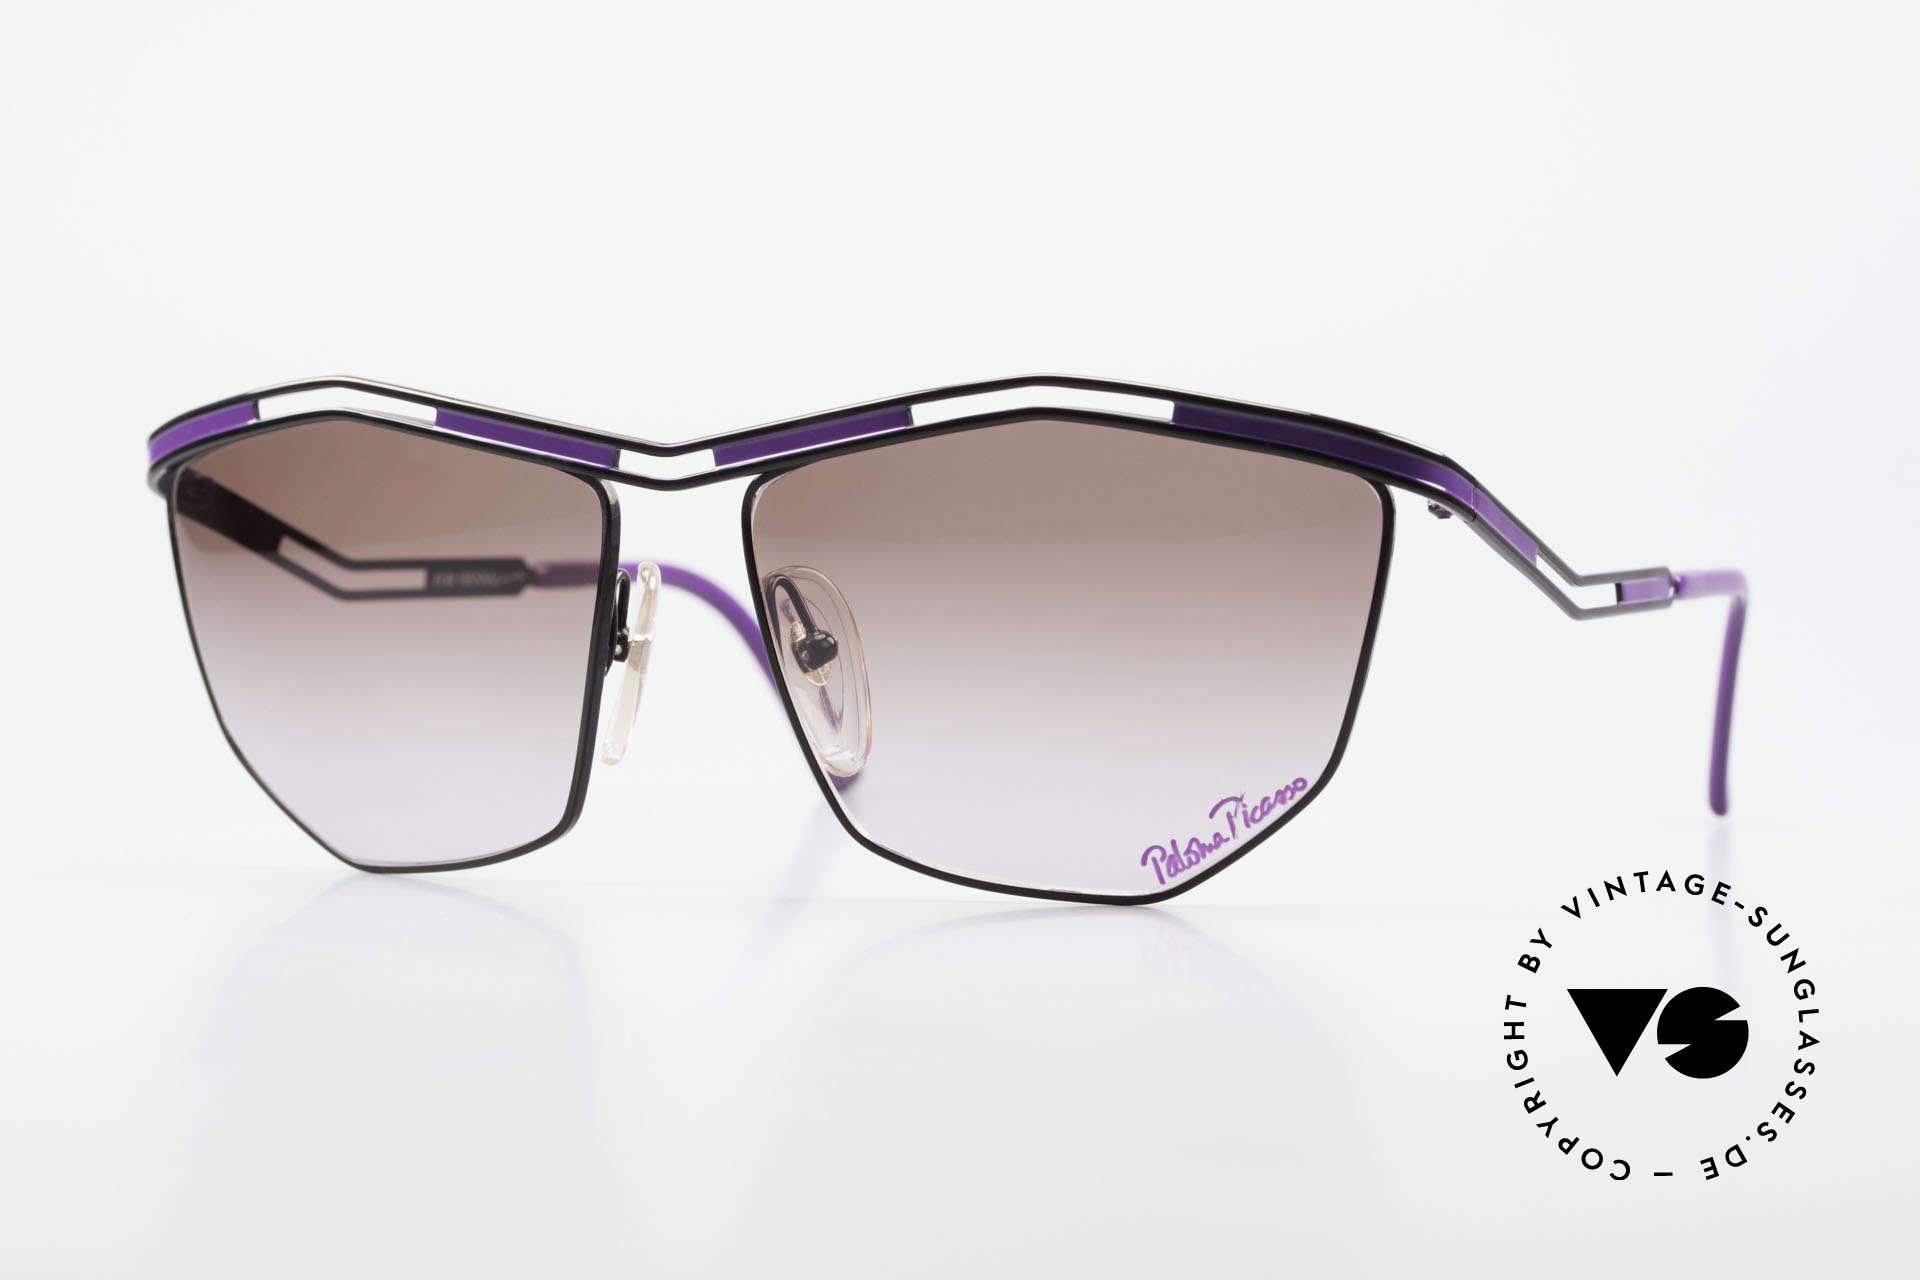 Paloma Picasso 1478 Rare 90er Damen Sonnenbrille, vintage Designersonnenbrille von Paloma Picasso, Passend für Damen